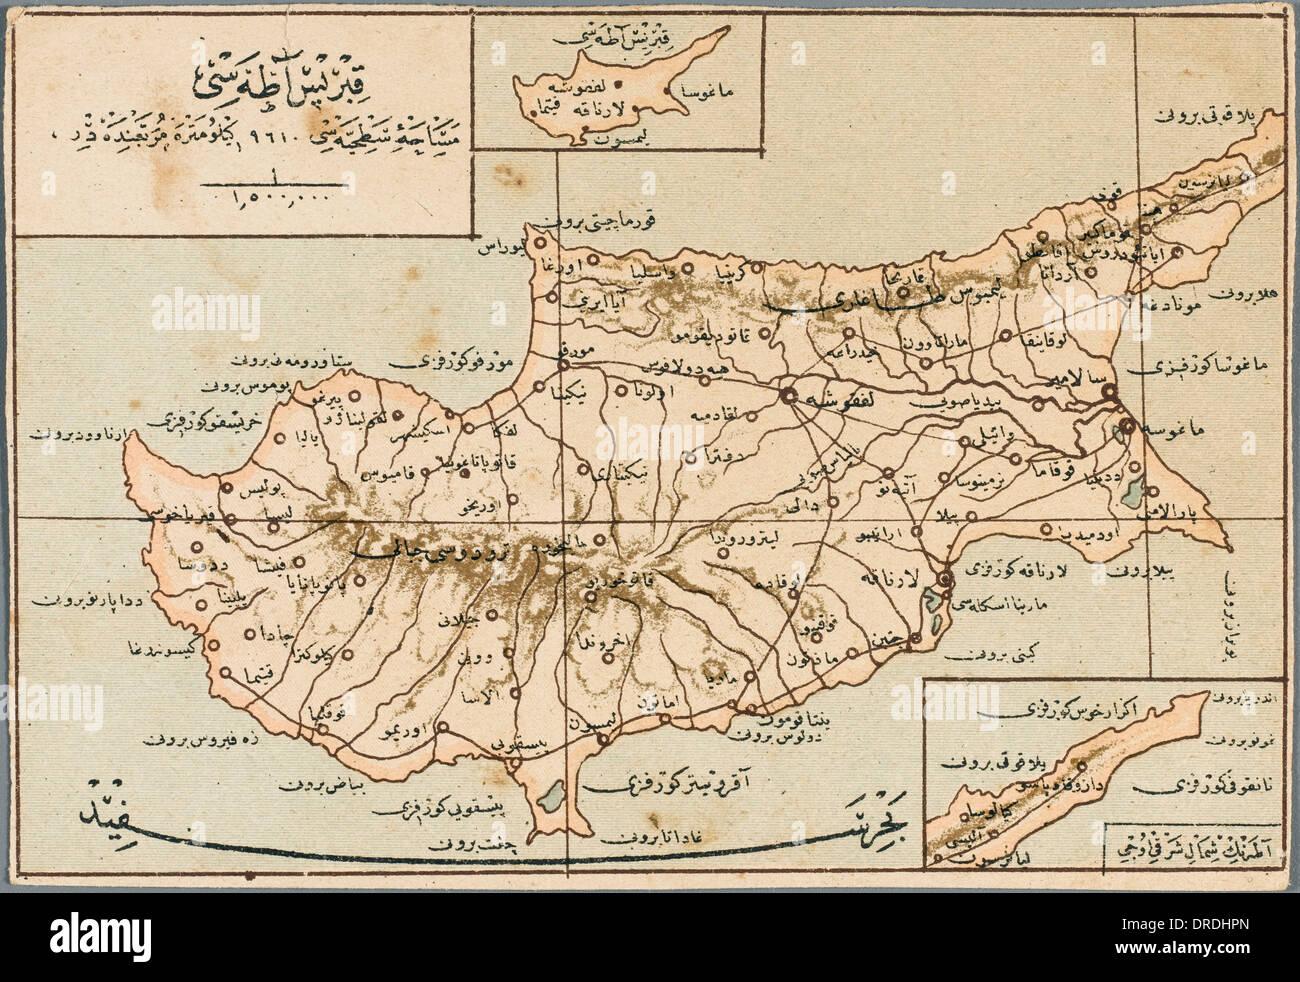 Ottoman map of Cyprus - Stock Image